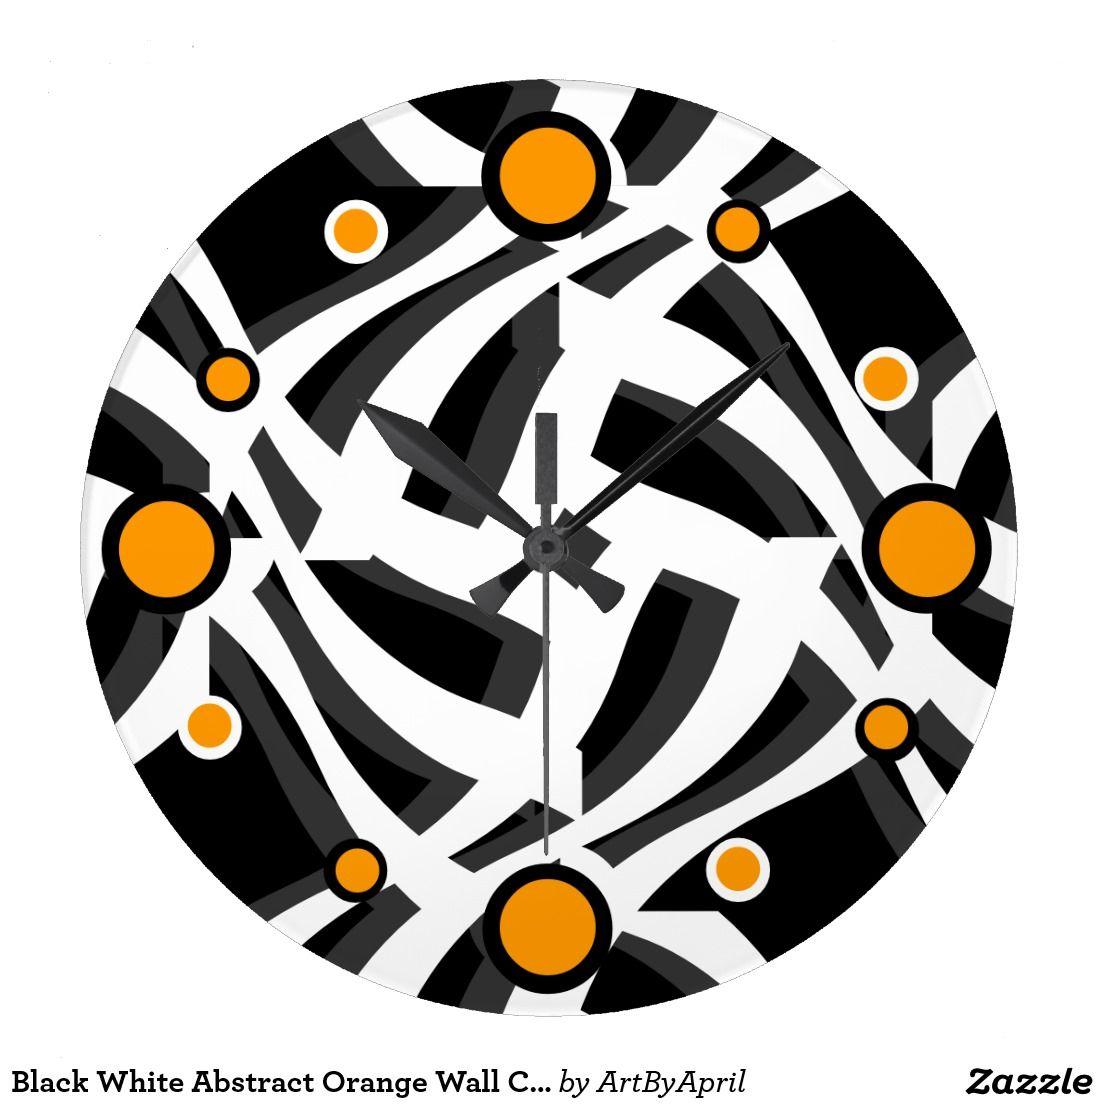 Black White Abstract Orange Wall Clock